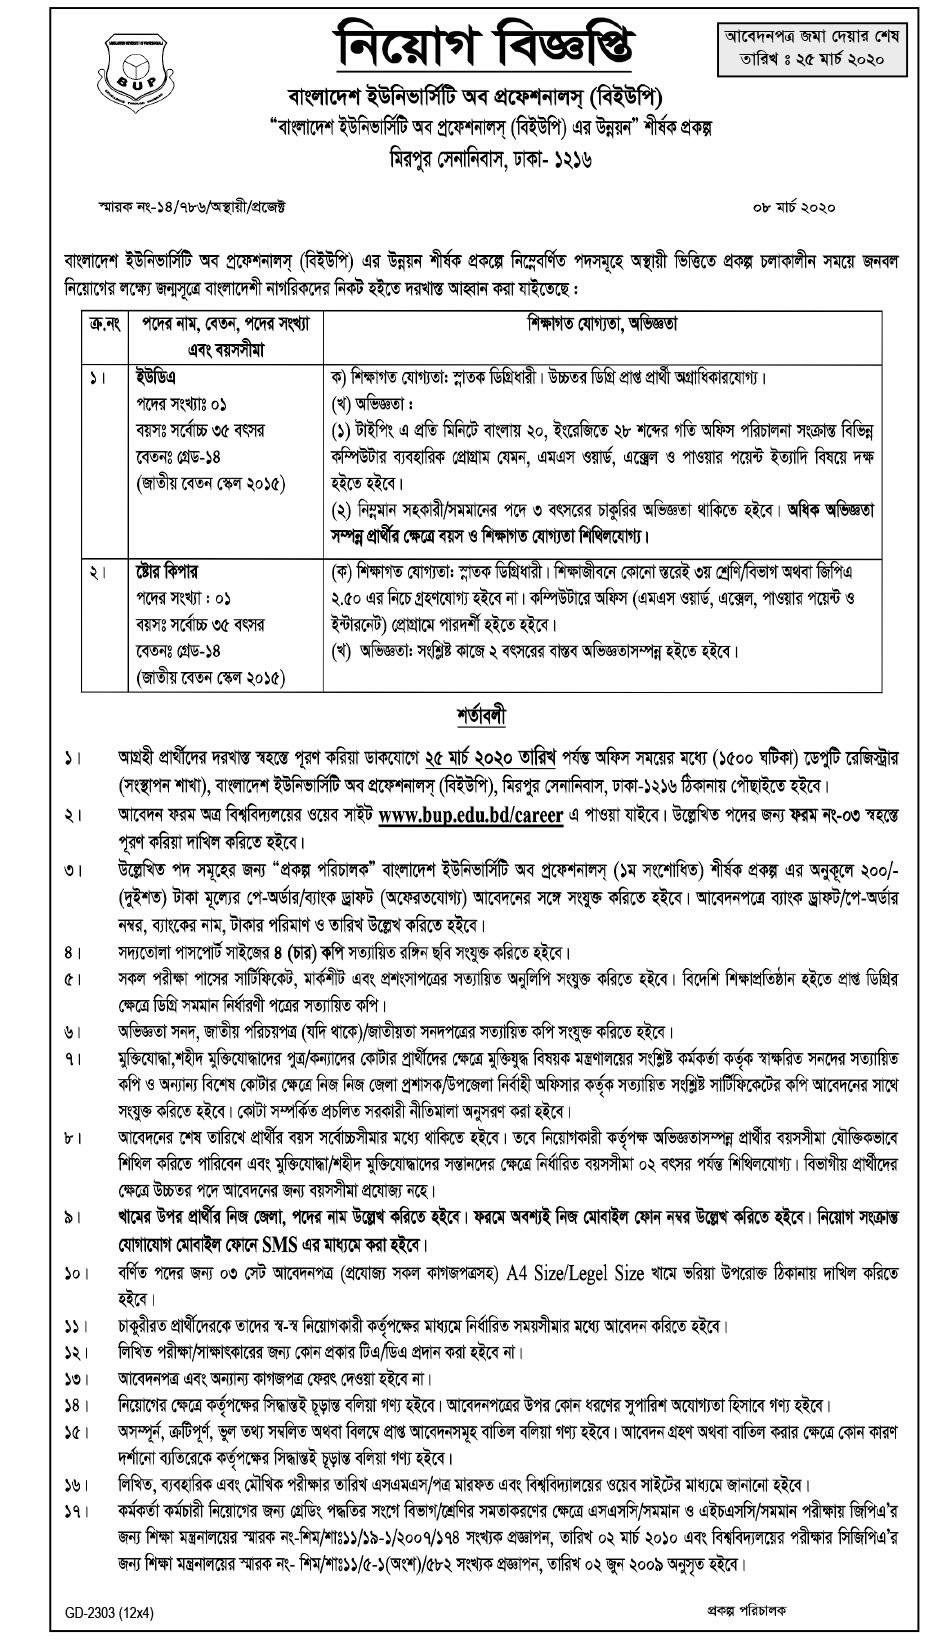 Bangladesh University of Professionals (BUP) Job Circular 2020